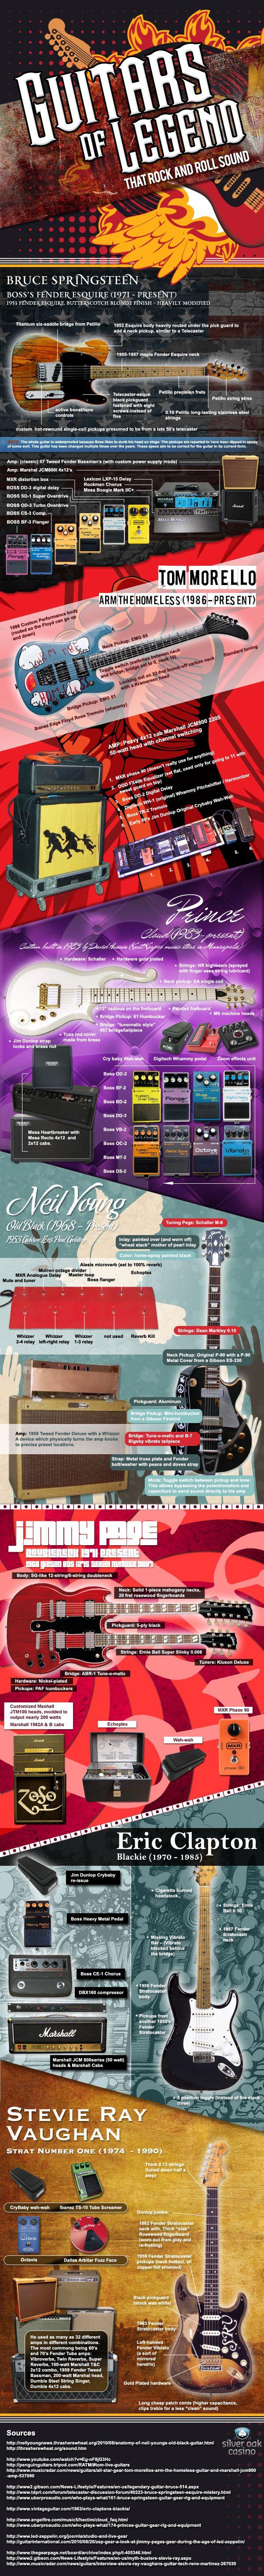 Guitars of Legend: That Rock a